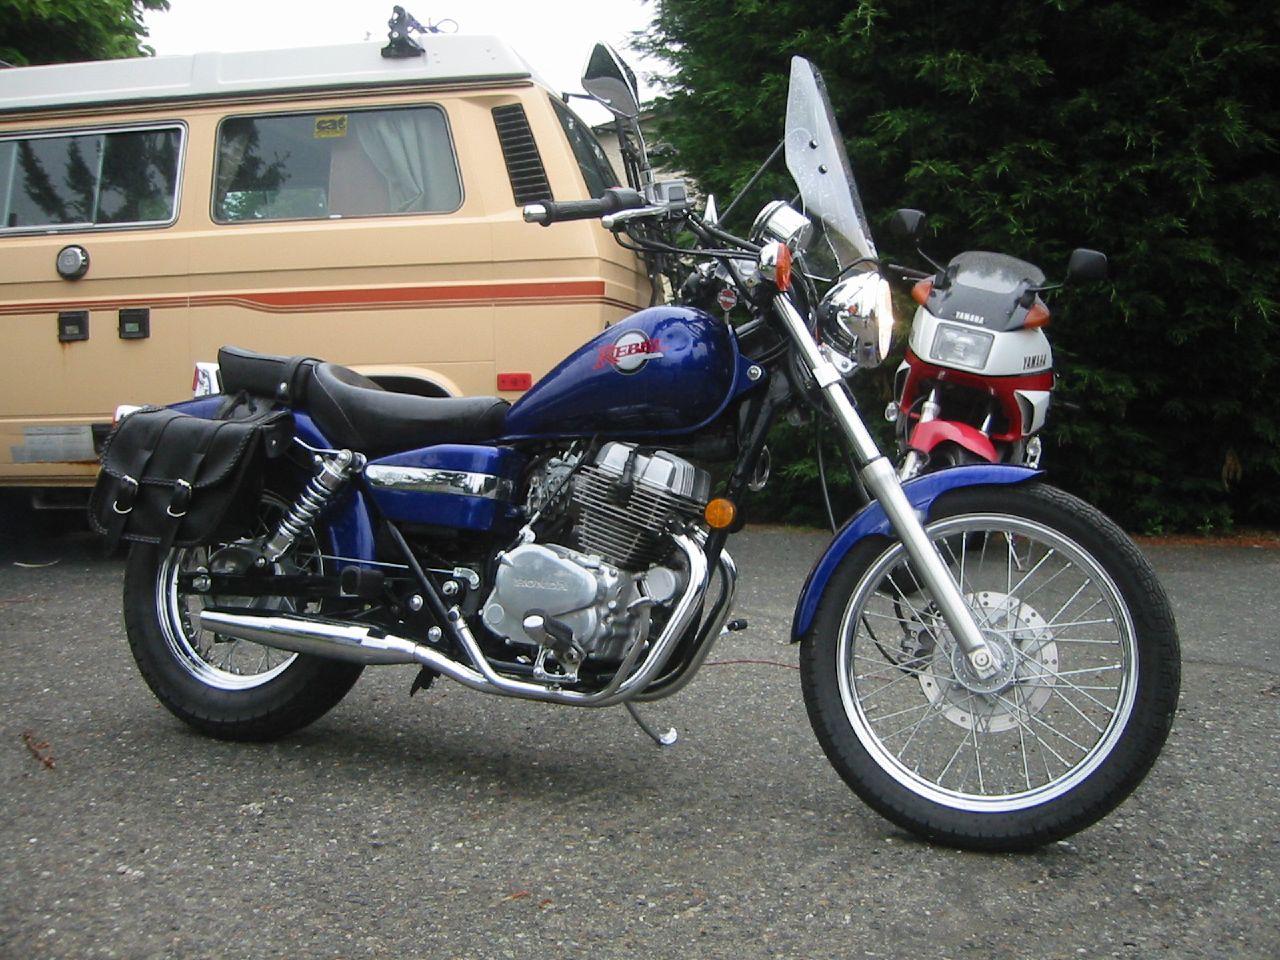 File:Honda Rebel blue.jpg - Wikimedia Commons